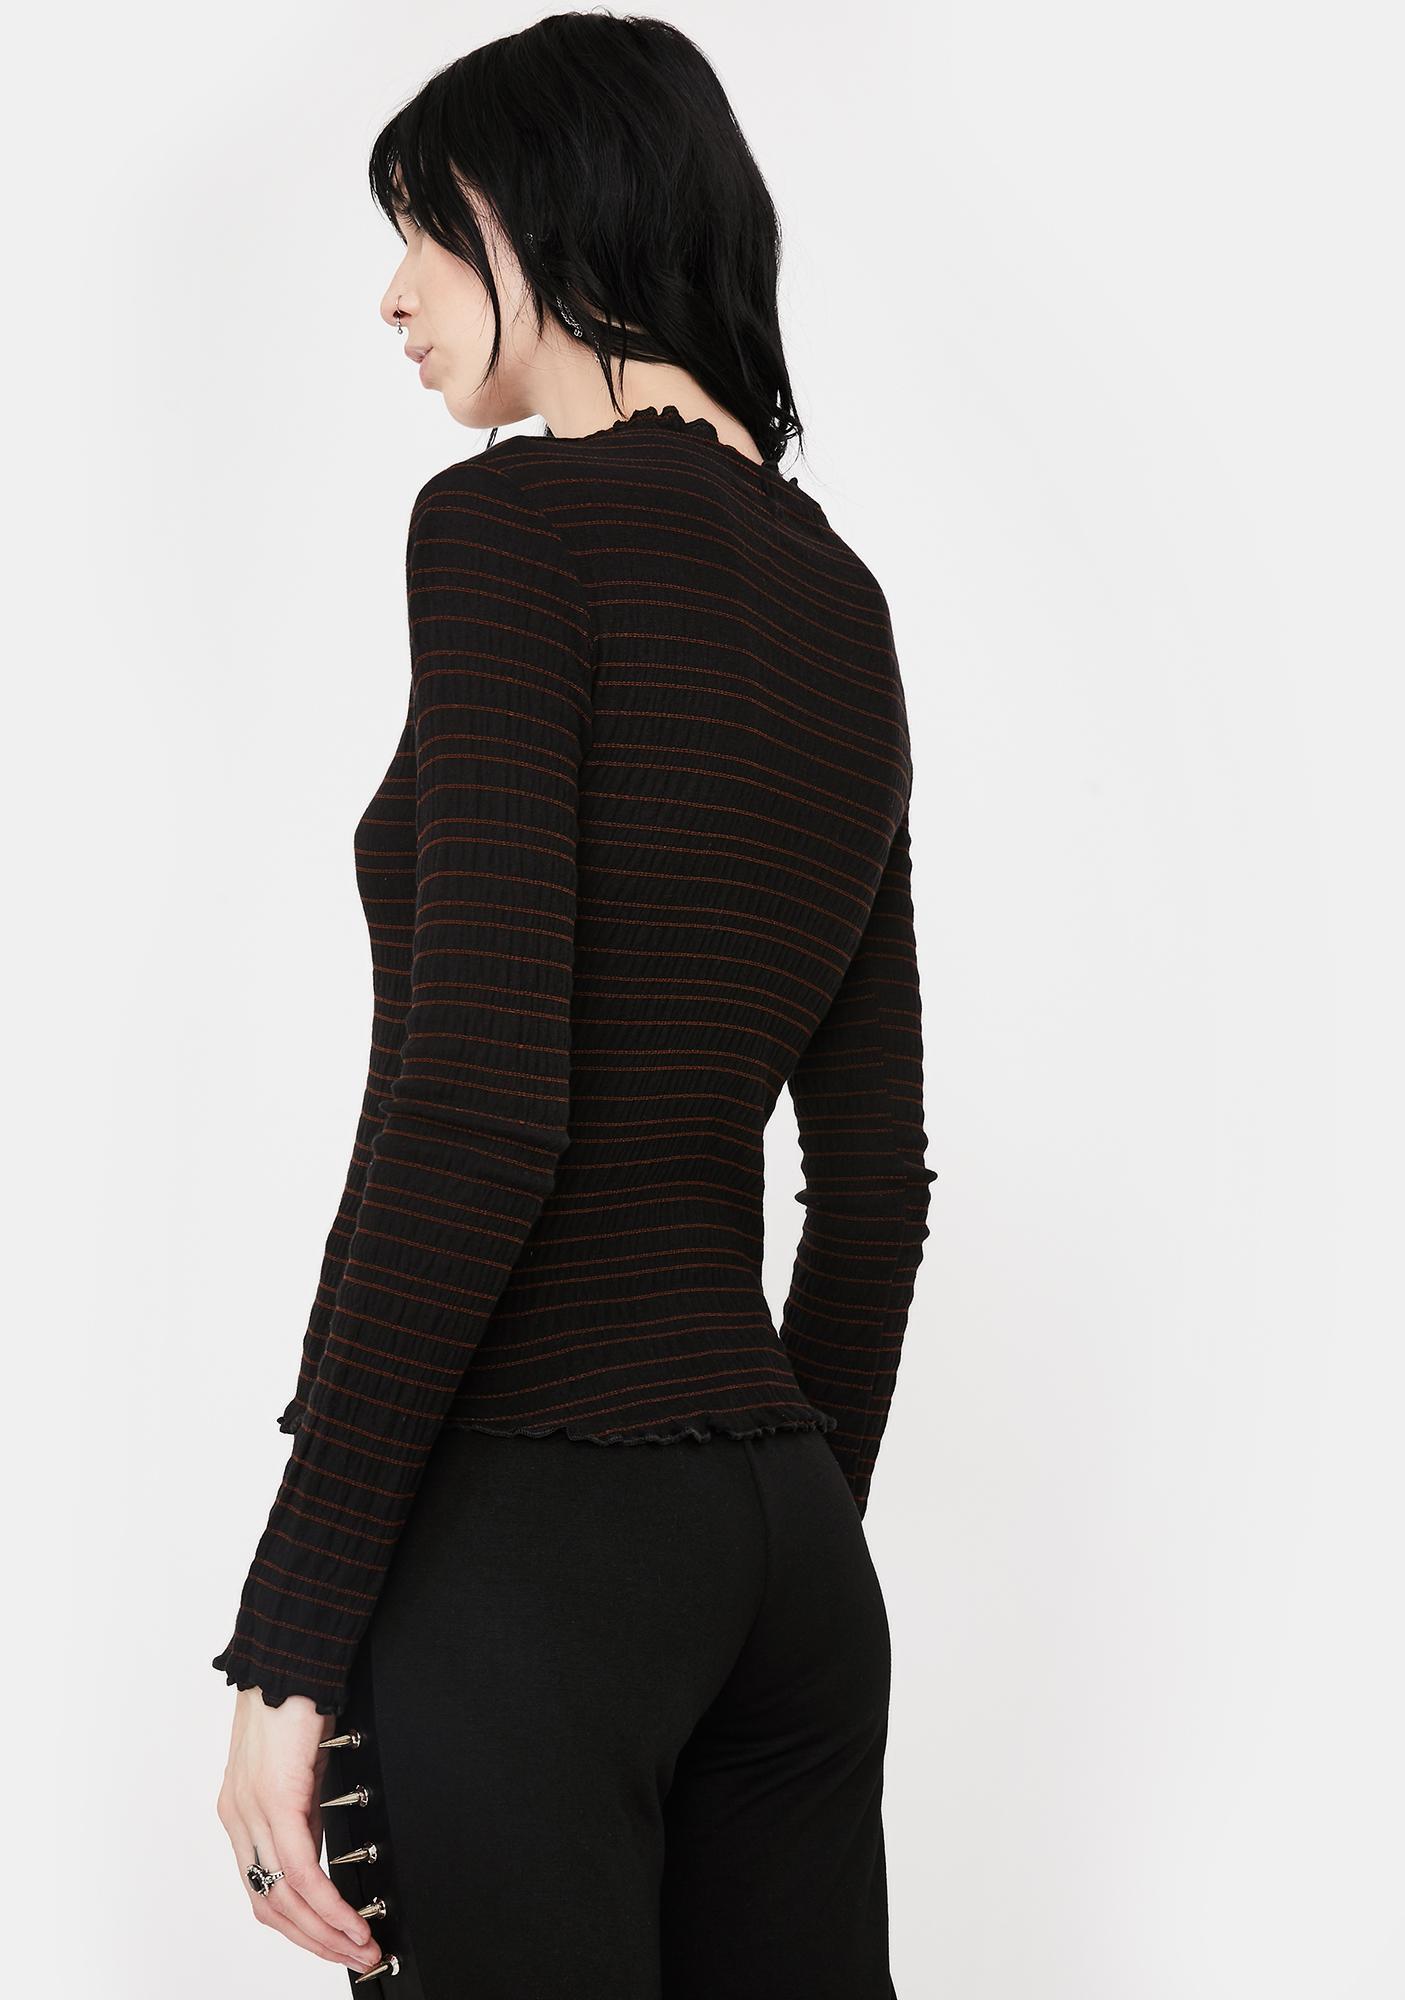 NOCTEX Black Ripl Long Sleeve Top